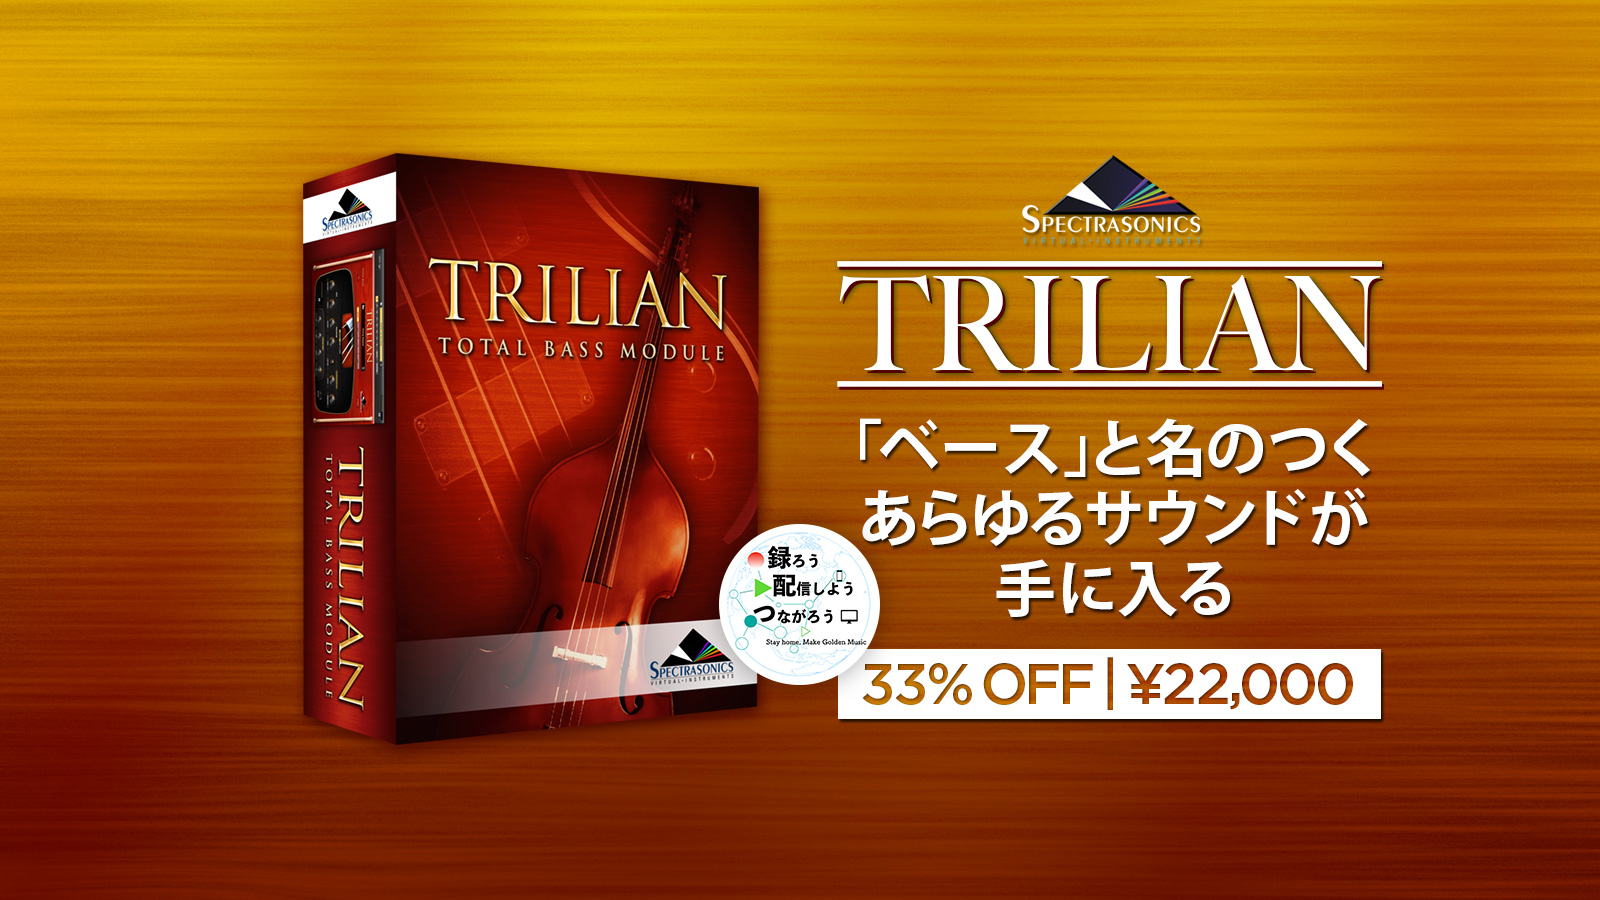 【33%OFF】ベース音源の金字塔 Spectrasonics Trilian がセール中!